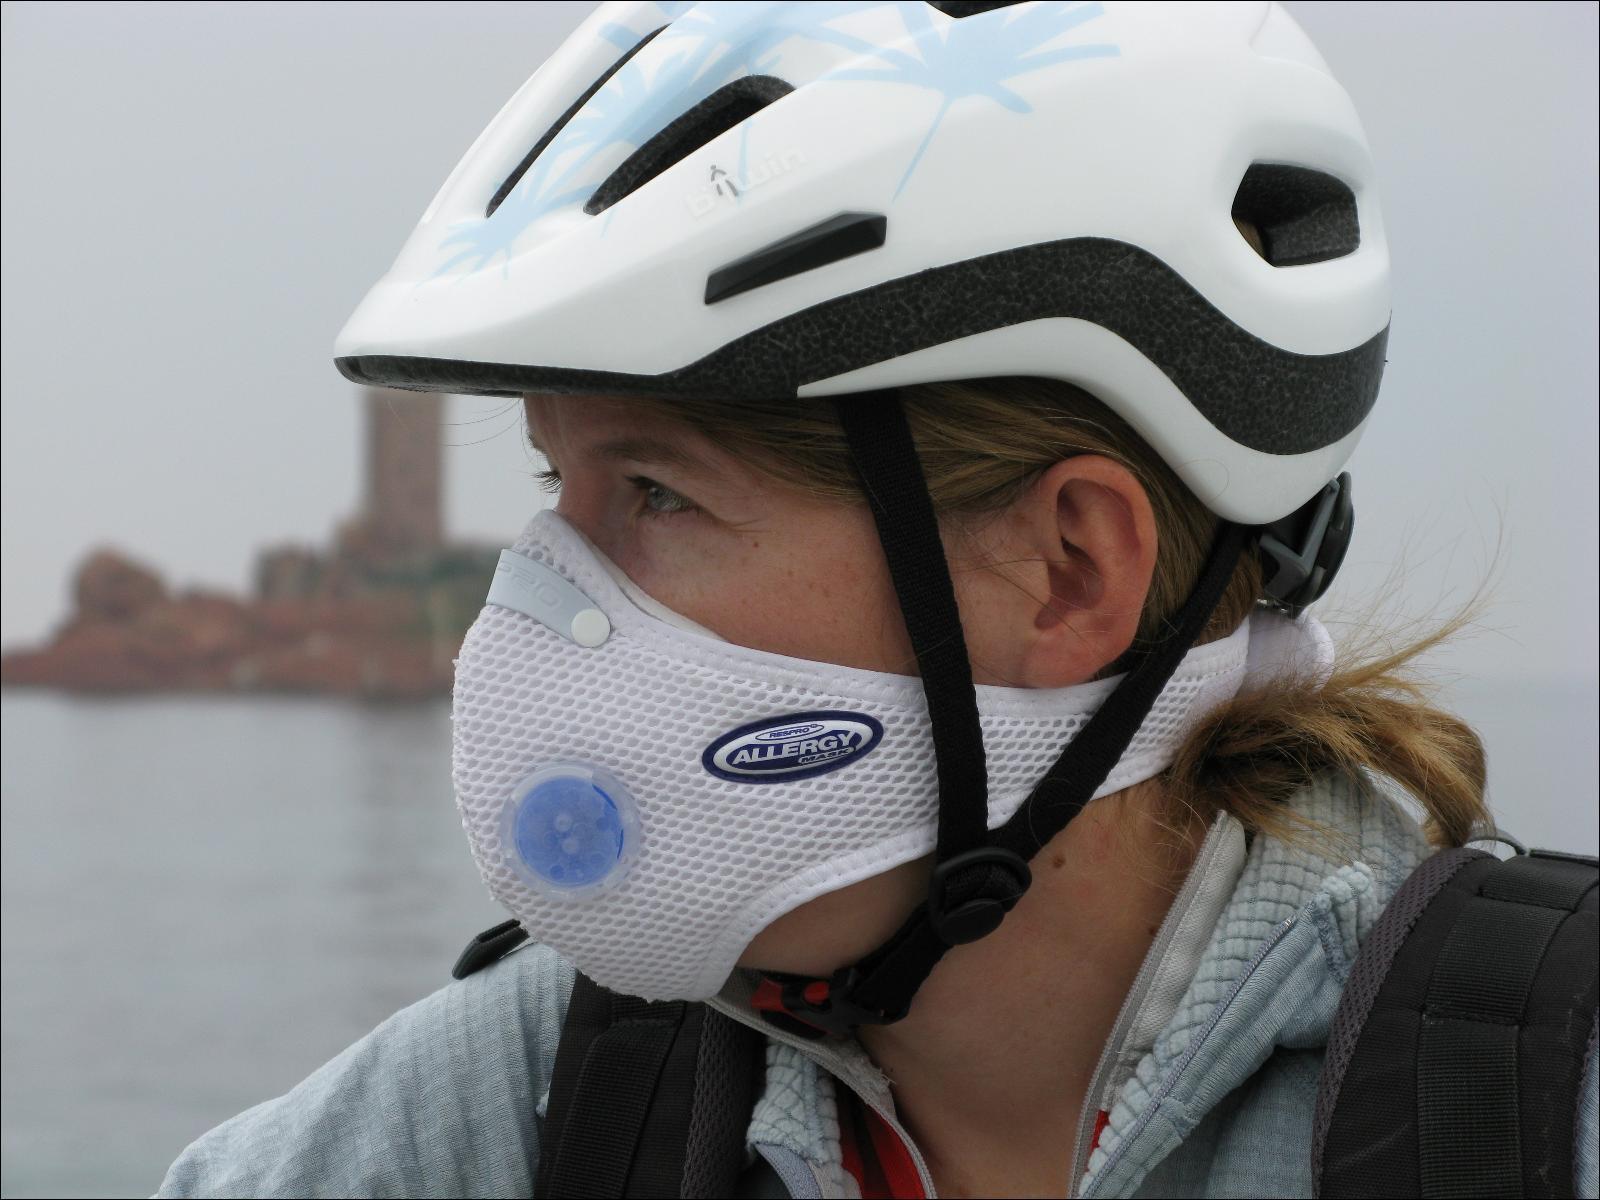 masque antipollution pour le v lo respro. Black Bedroom Furniture Sets. Home Design Ideas